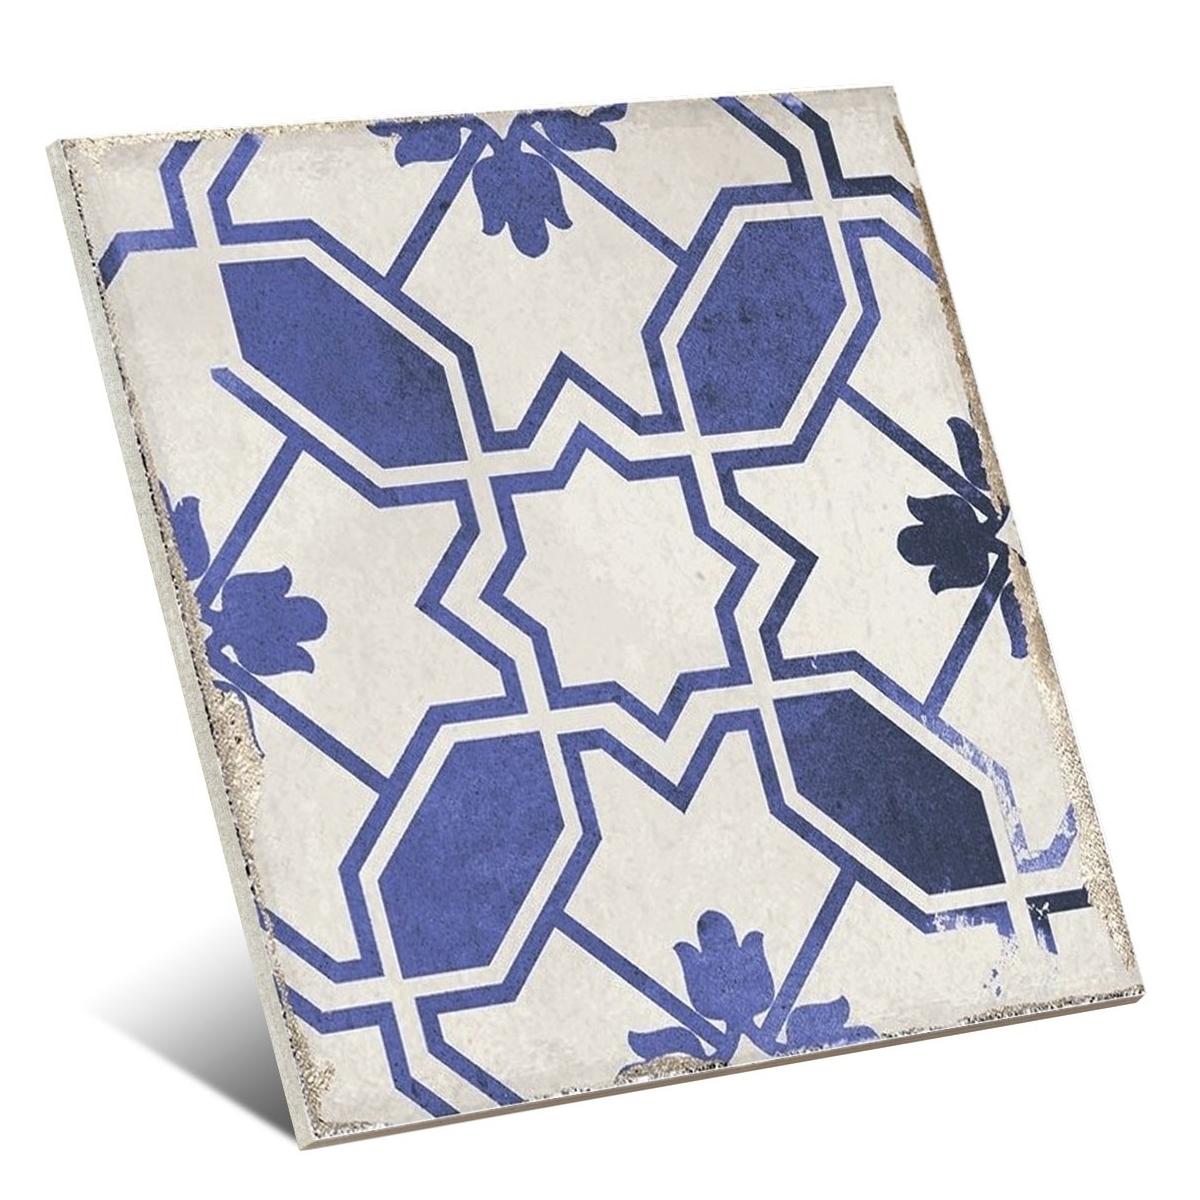 Caleta-blue-village 15x15 (caja 0,5 m2)